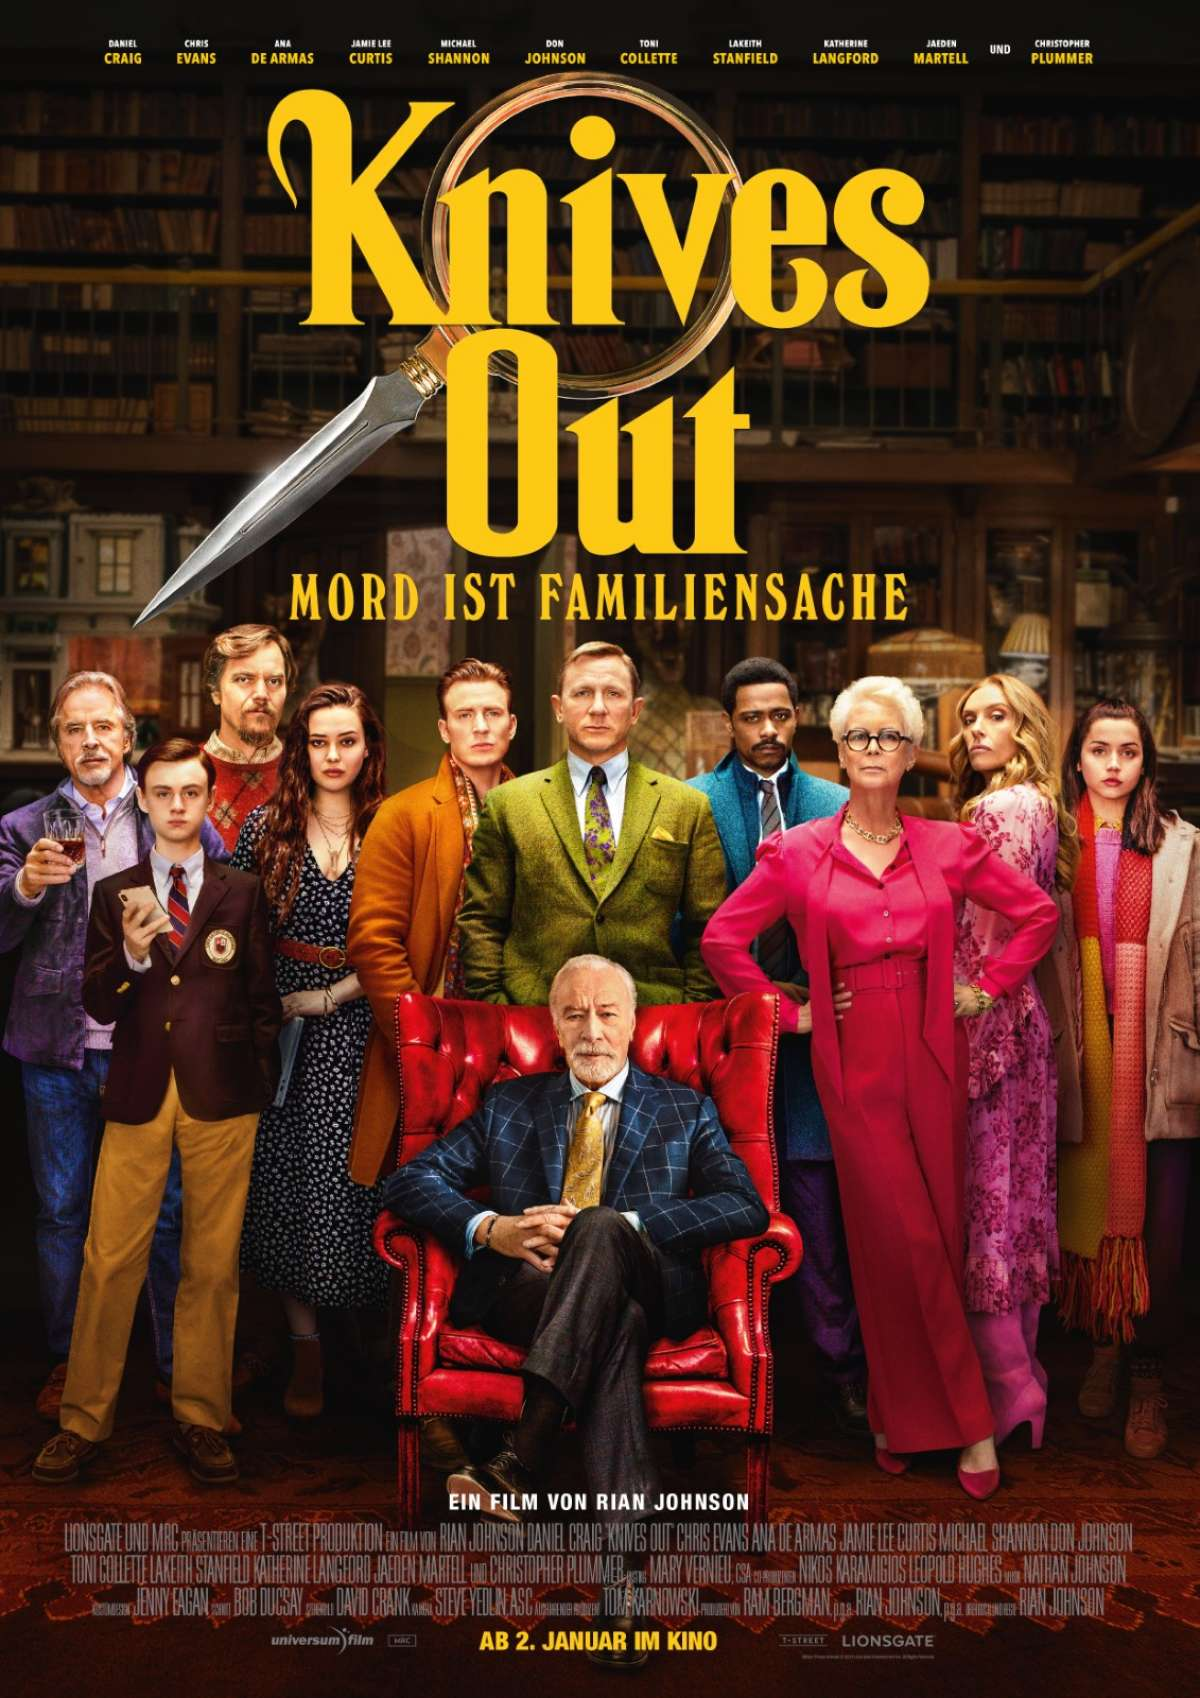 Knives Out - Mord ist Familiensache - Dock 4 (Hof) - Kassel